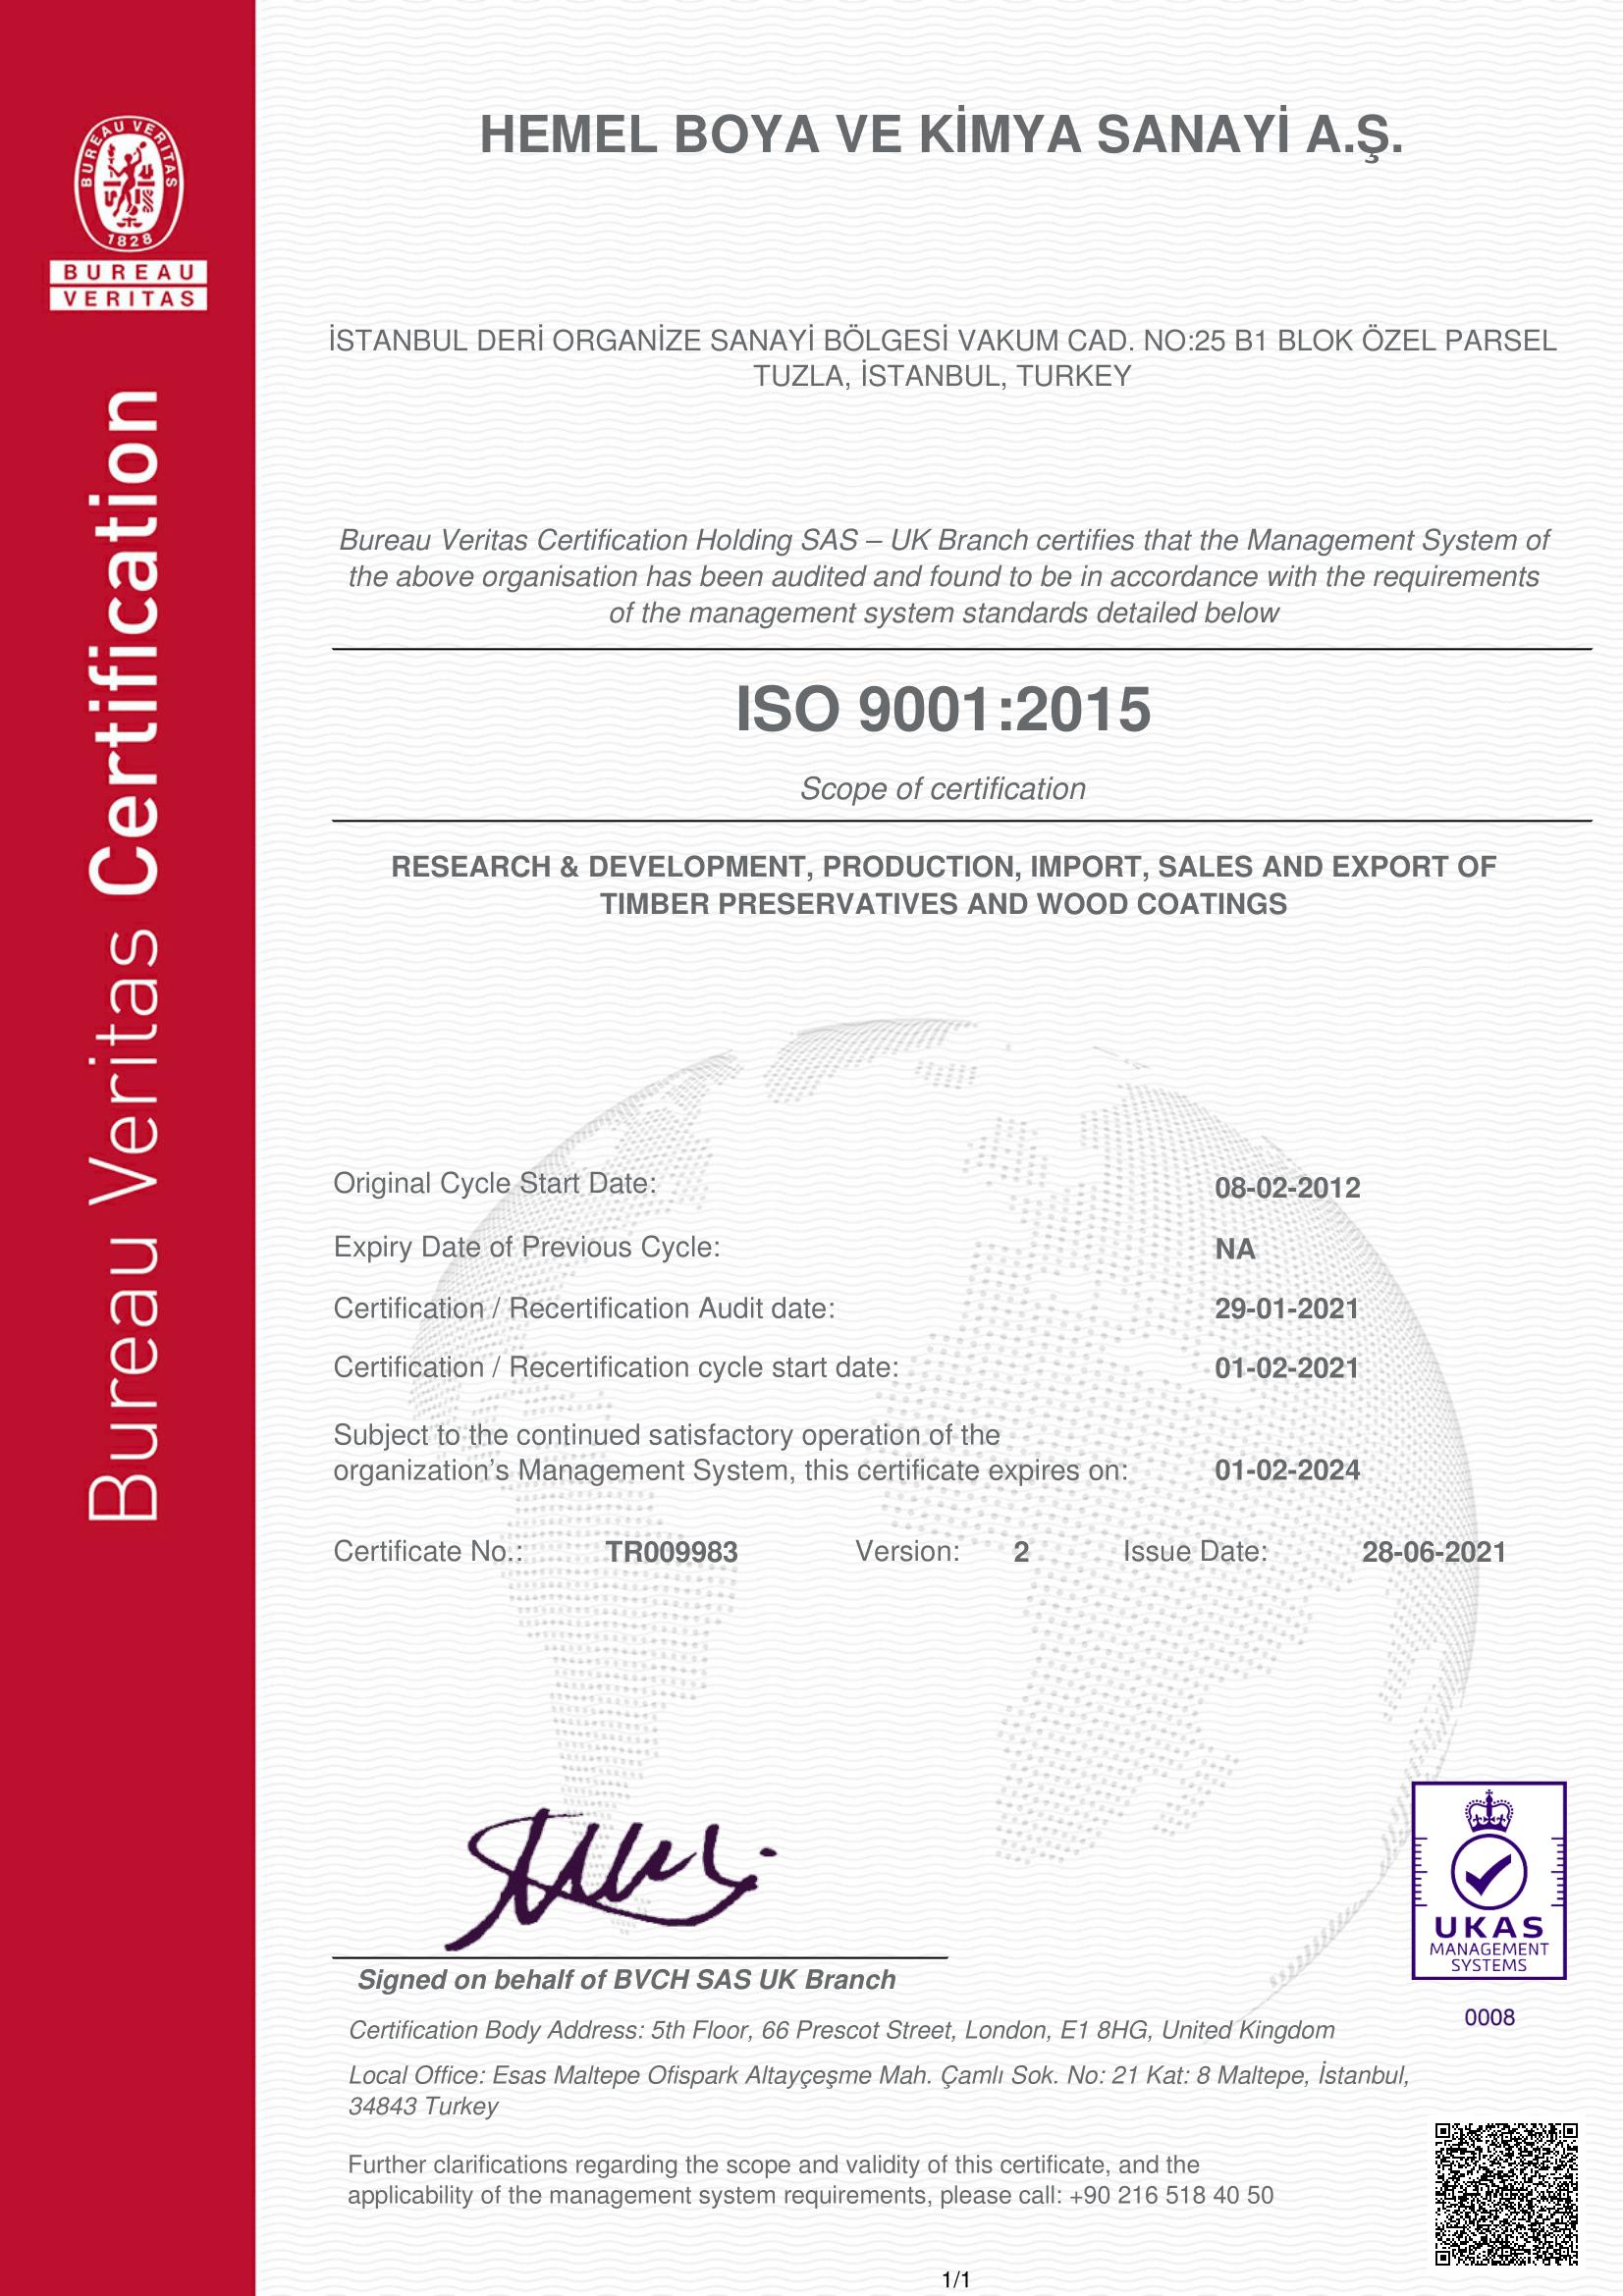 ISO9001-2015-Hemel-2021.png (515 KB)